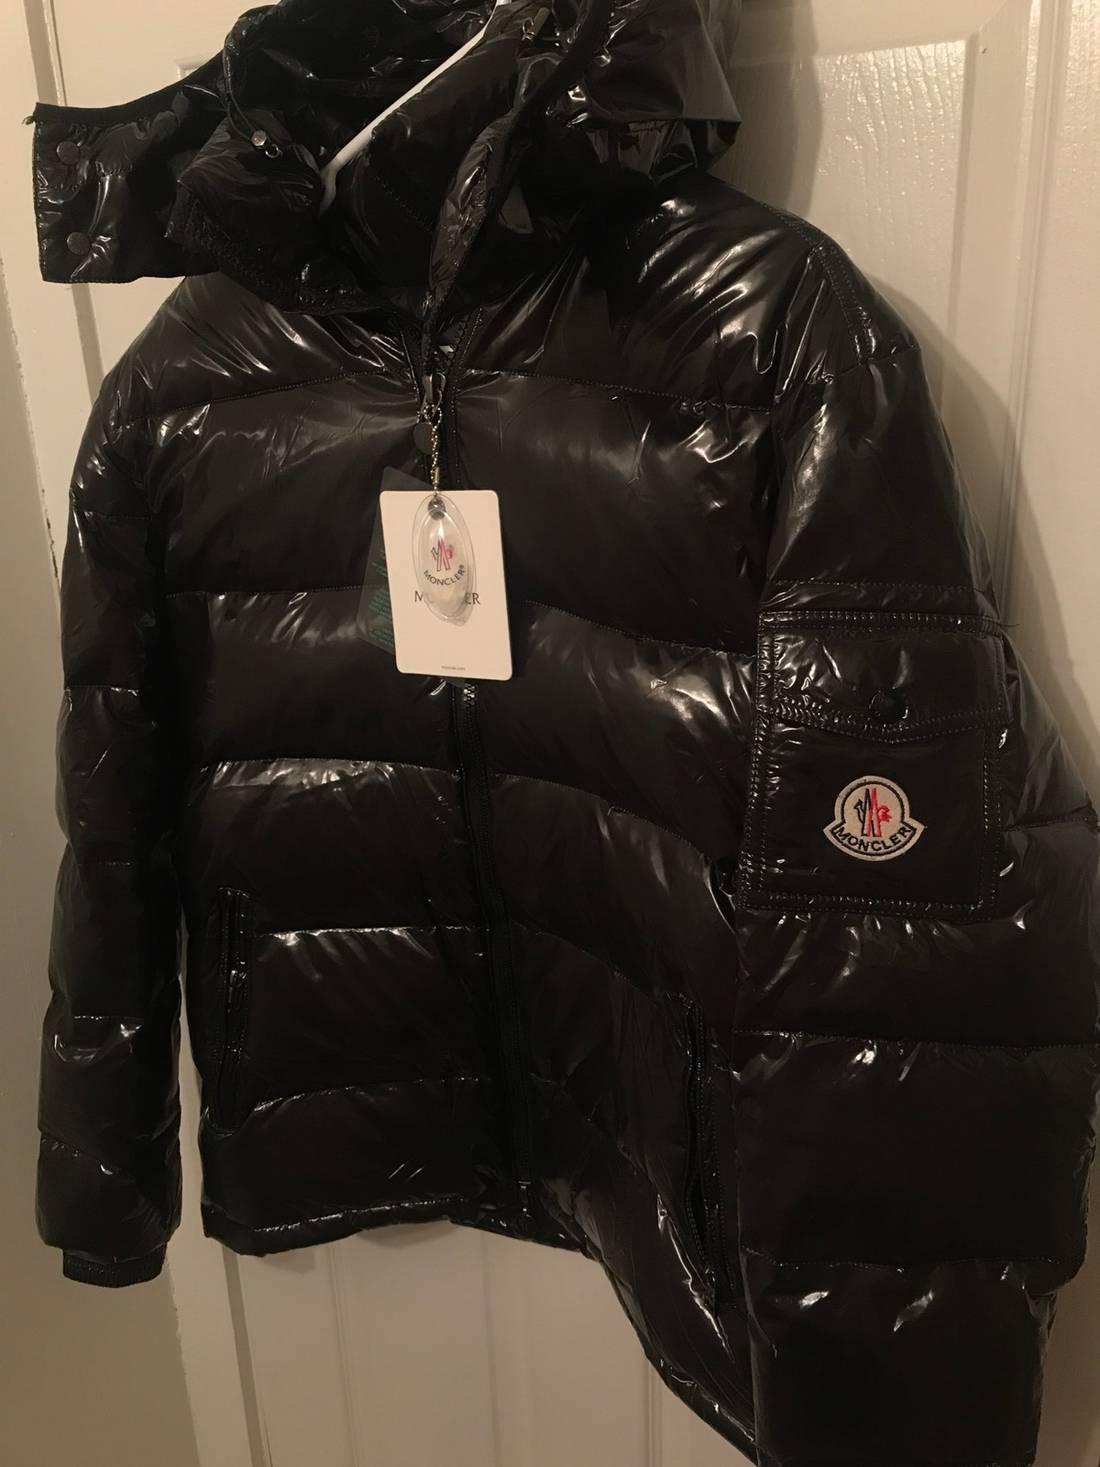 5eb72f630 greece moncler maya jacket black hole 559a6 9eed5